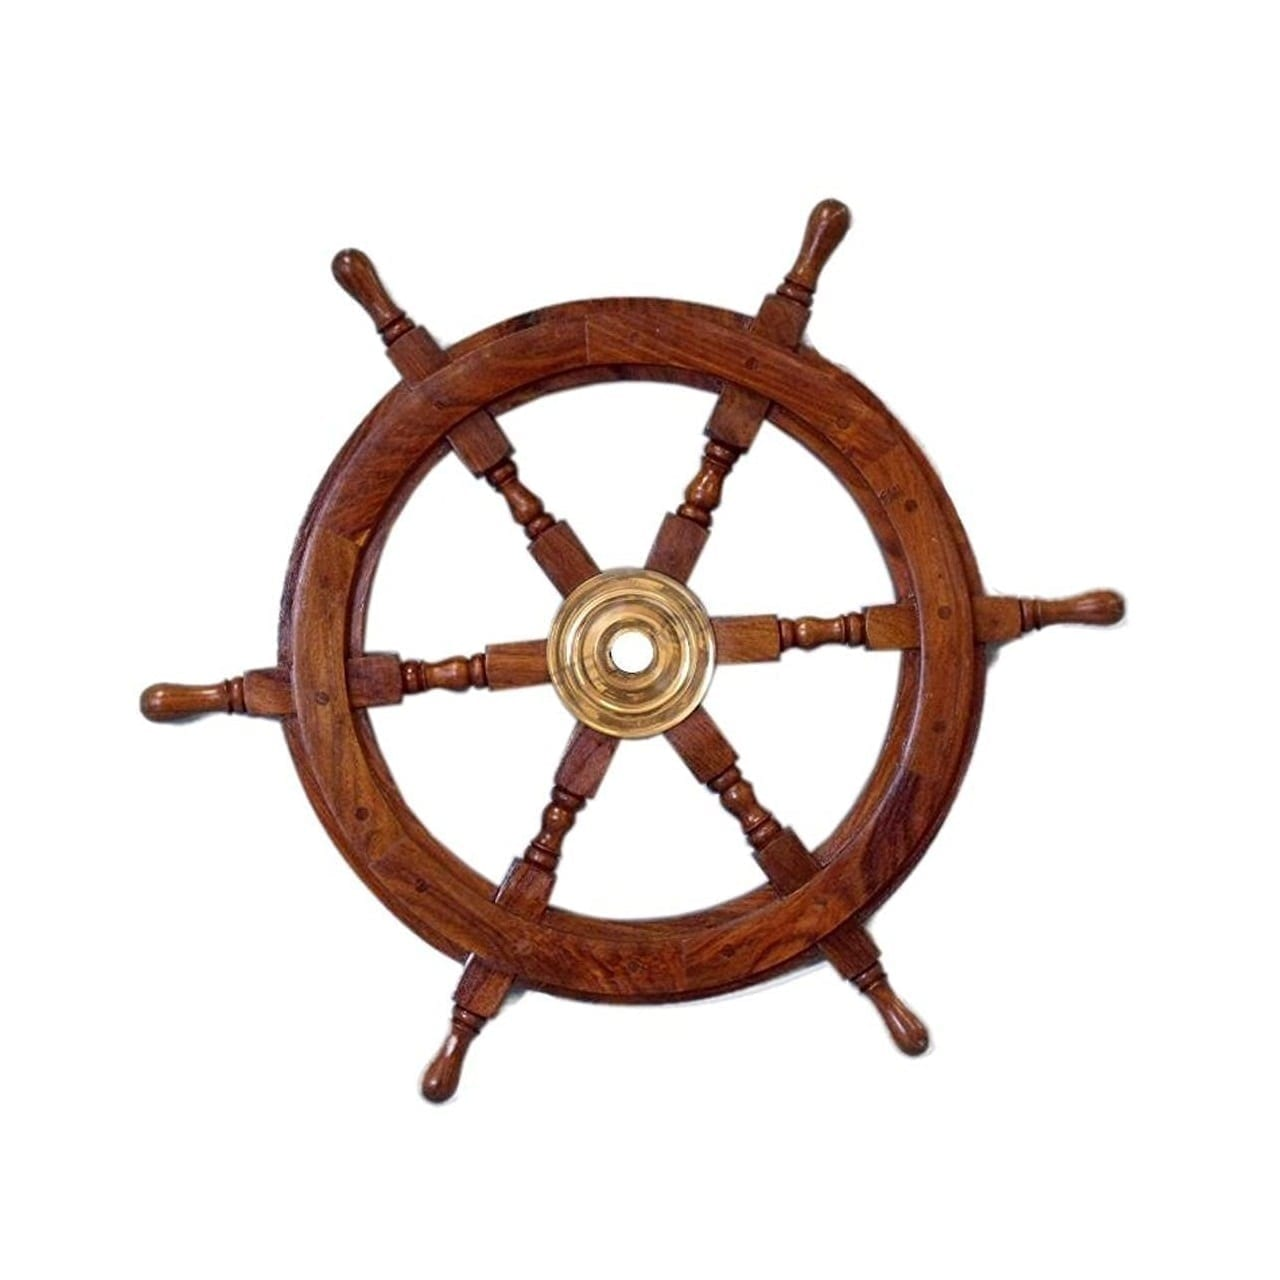 wood-ship-wheel-wall-decor Nautical Wood Wall Decor & Wooden Signs